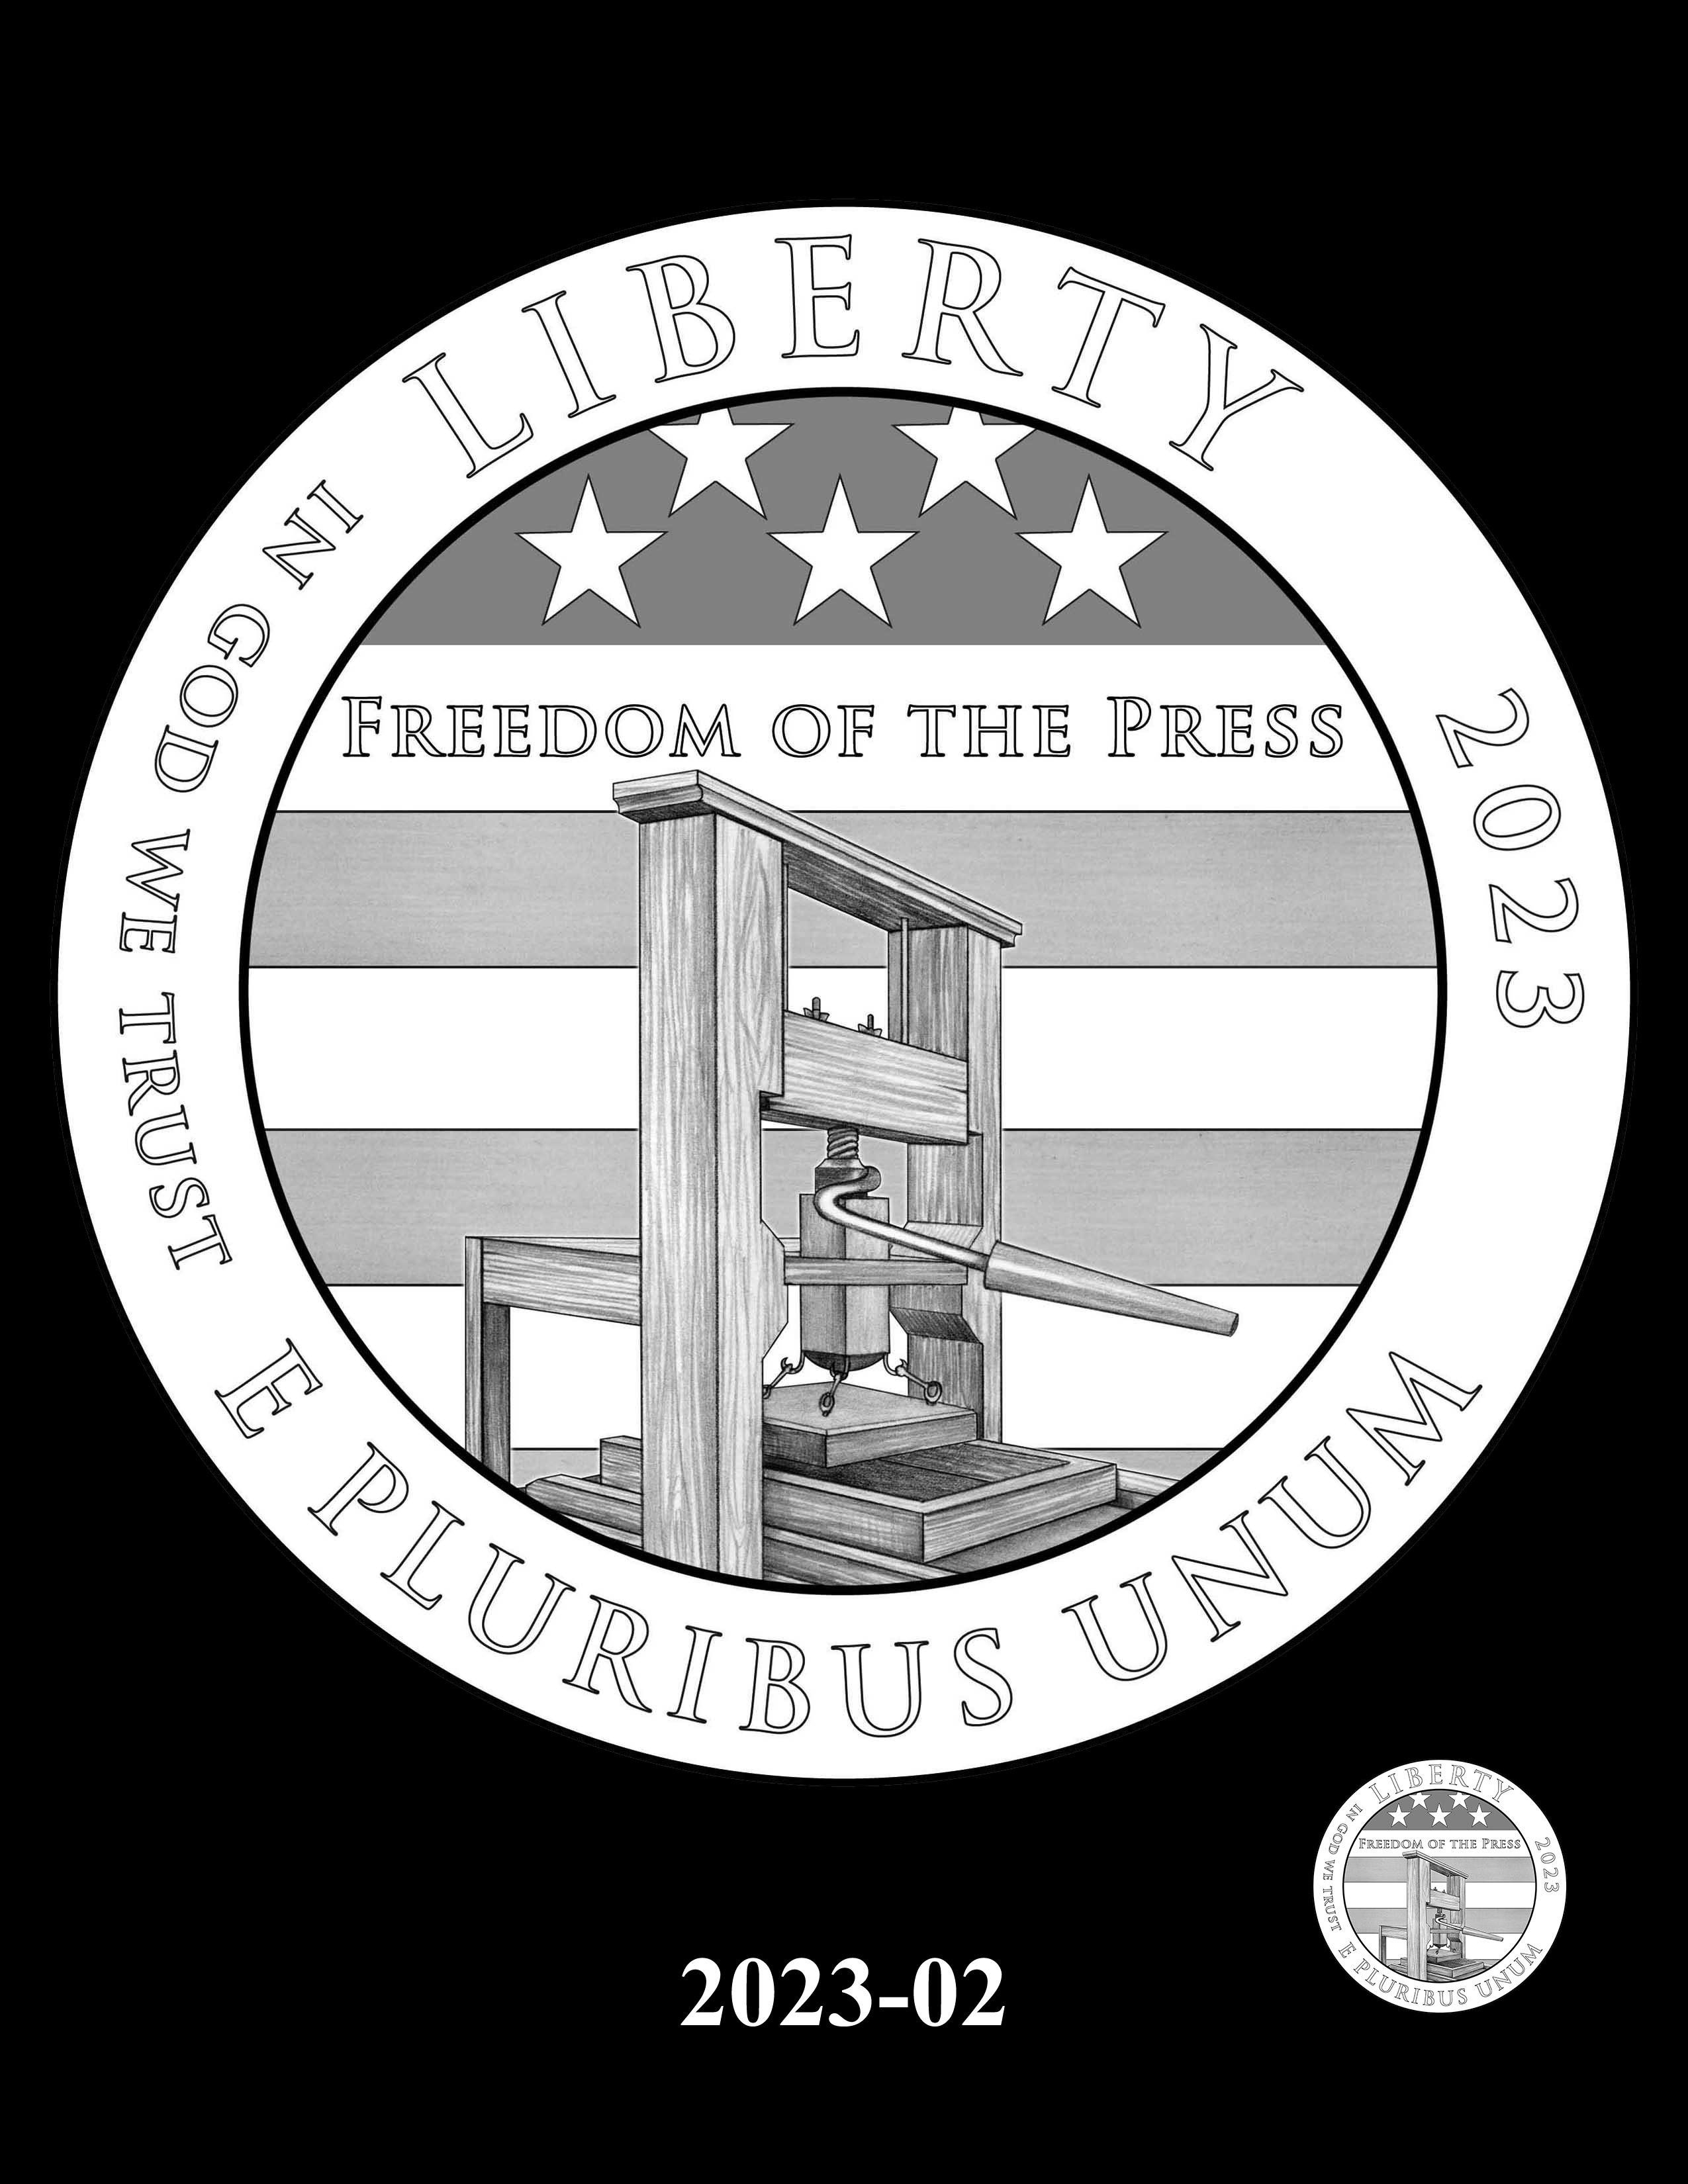 02-2023 -- 2021 - 2025 American Eagle Platinum Proof Program